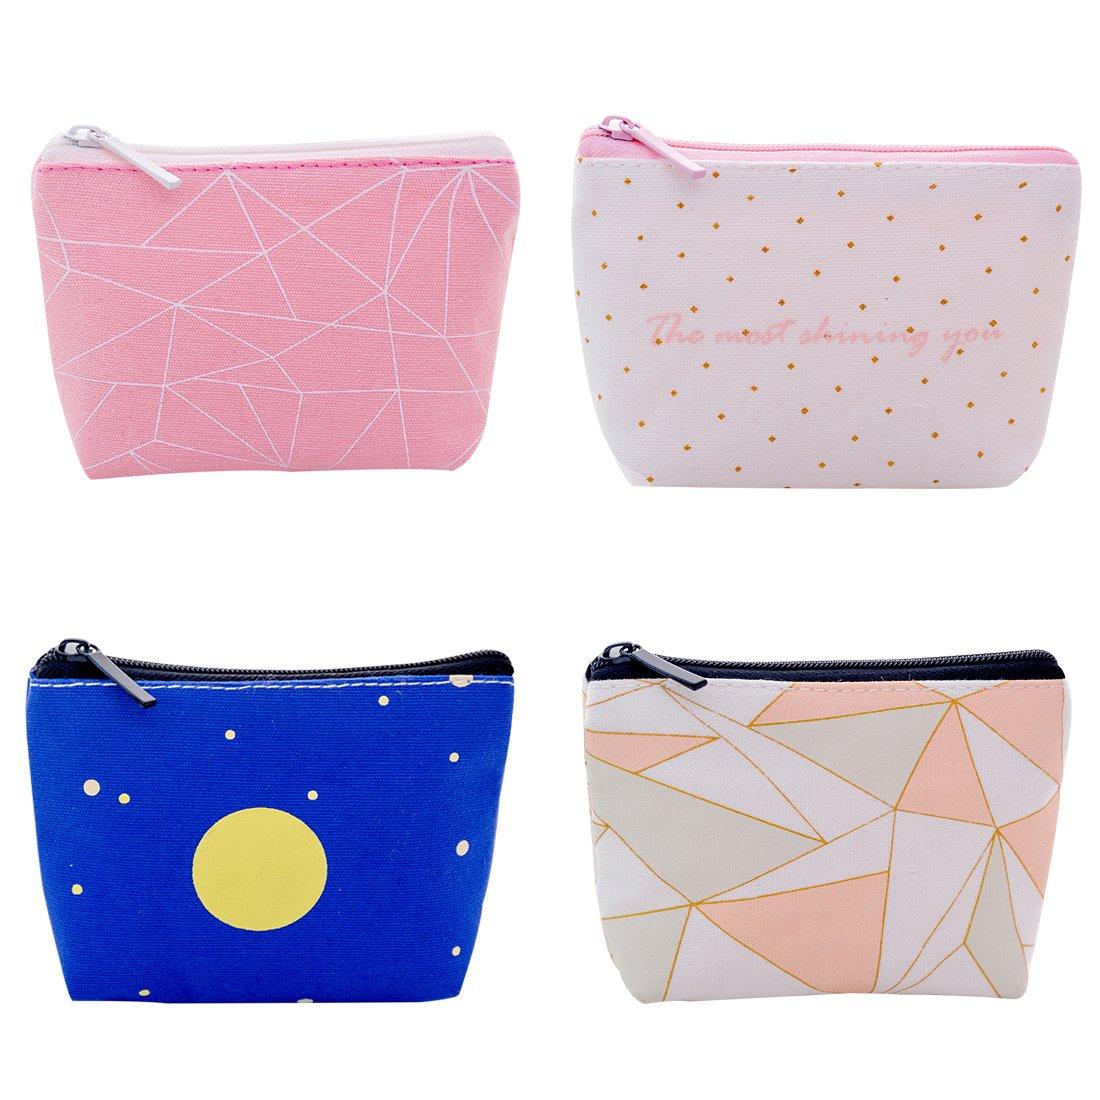 iSuperb Pack of 4 Coin Purse Change Cash Bag Zipper Mini Wallet Bag (PU leather Animal)